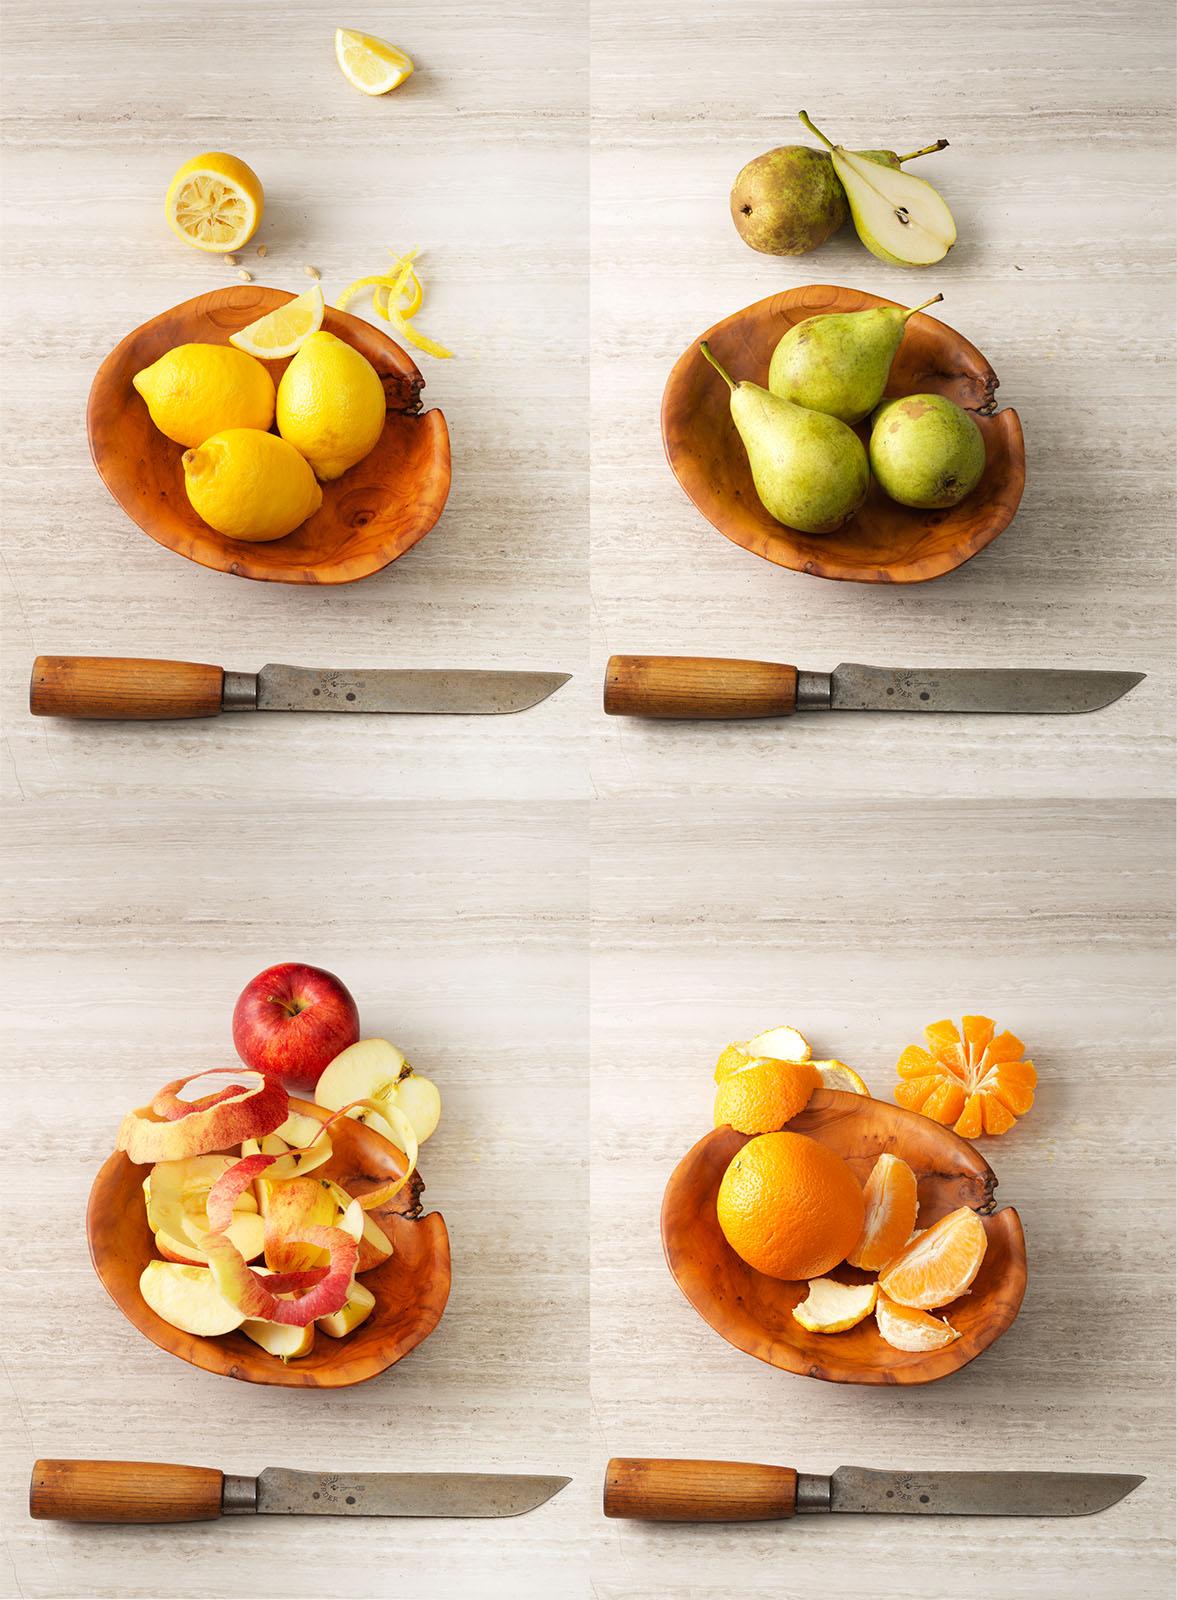 https://crisp.cc/wp-content/uploads/2019/09/Herdersmes-fruit.jpg